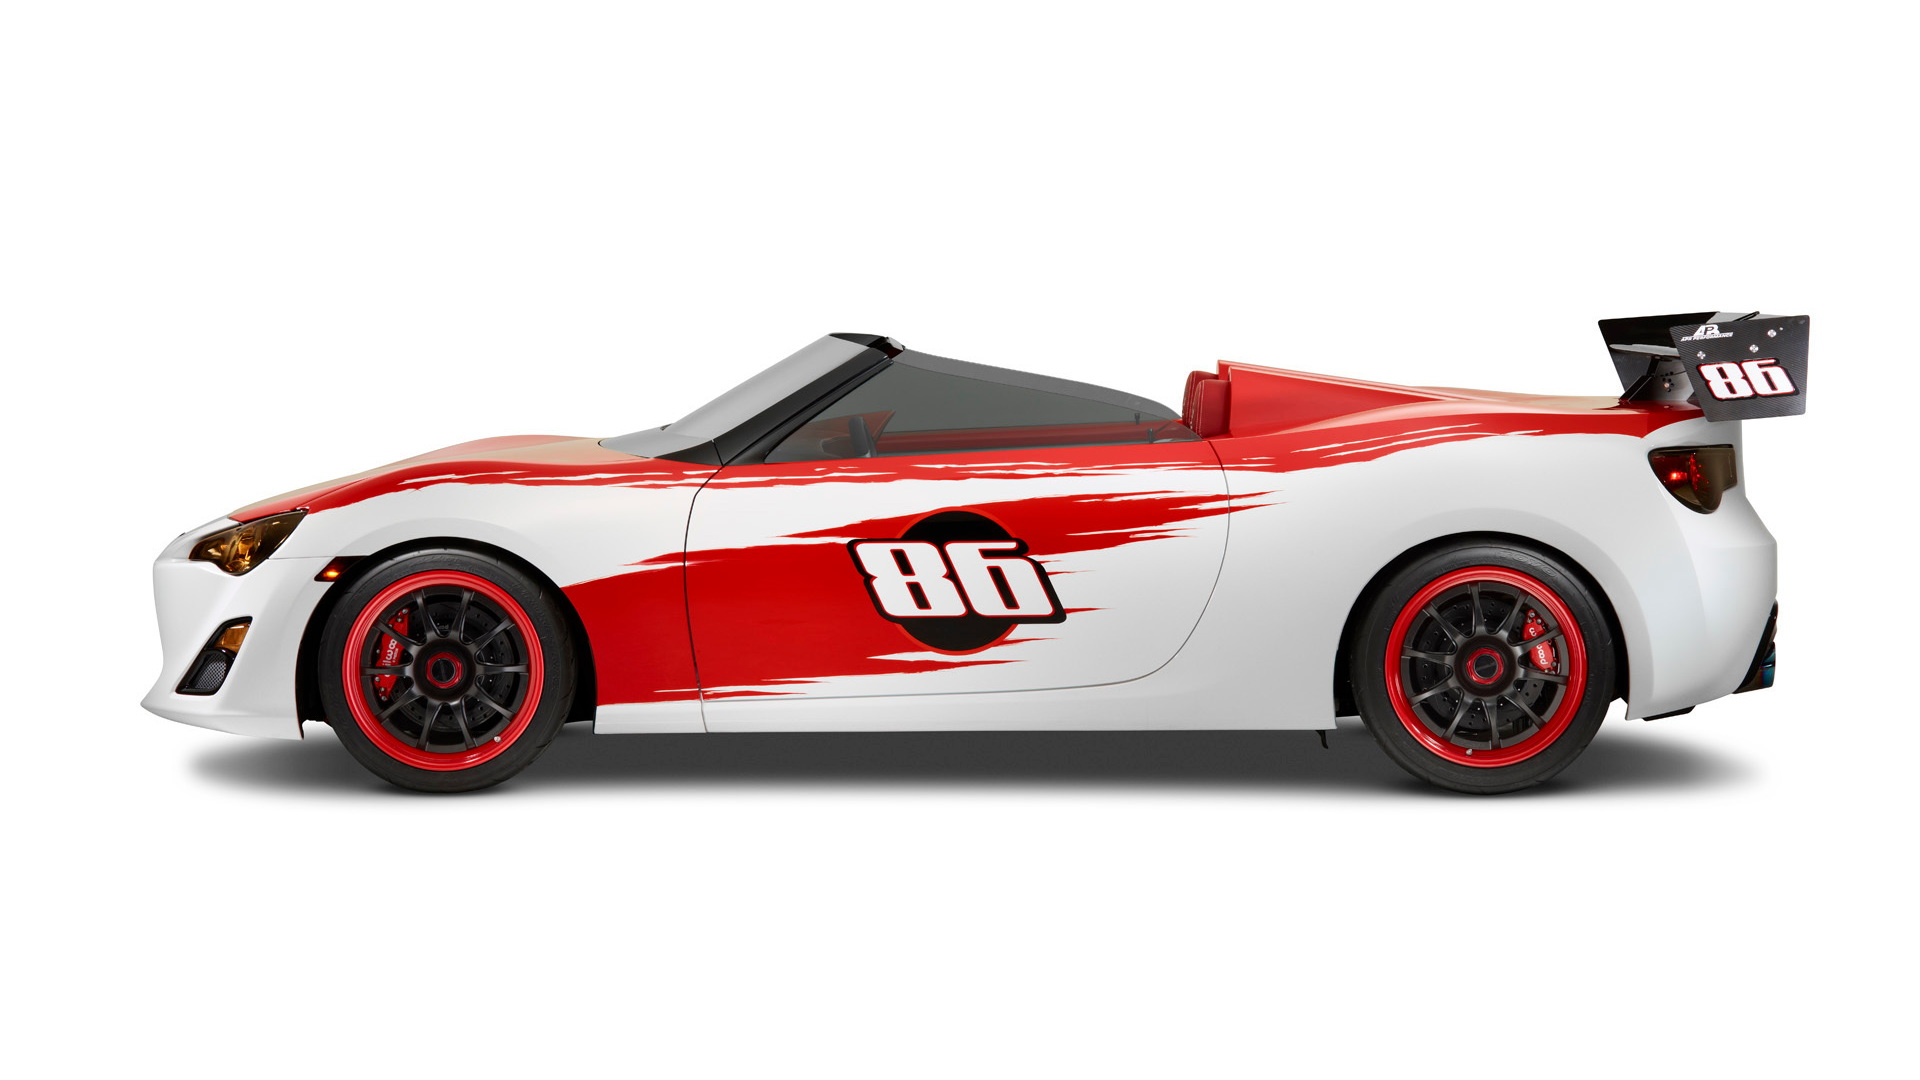 Cartel Customs 2013 Scion FR-S Speedster